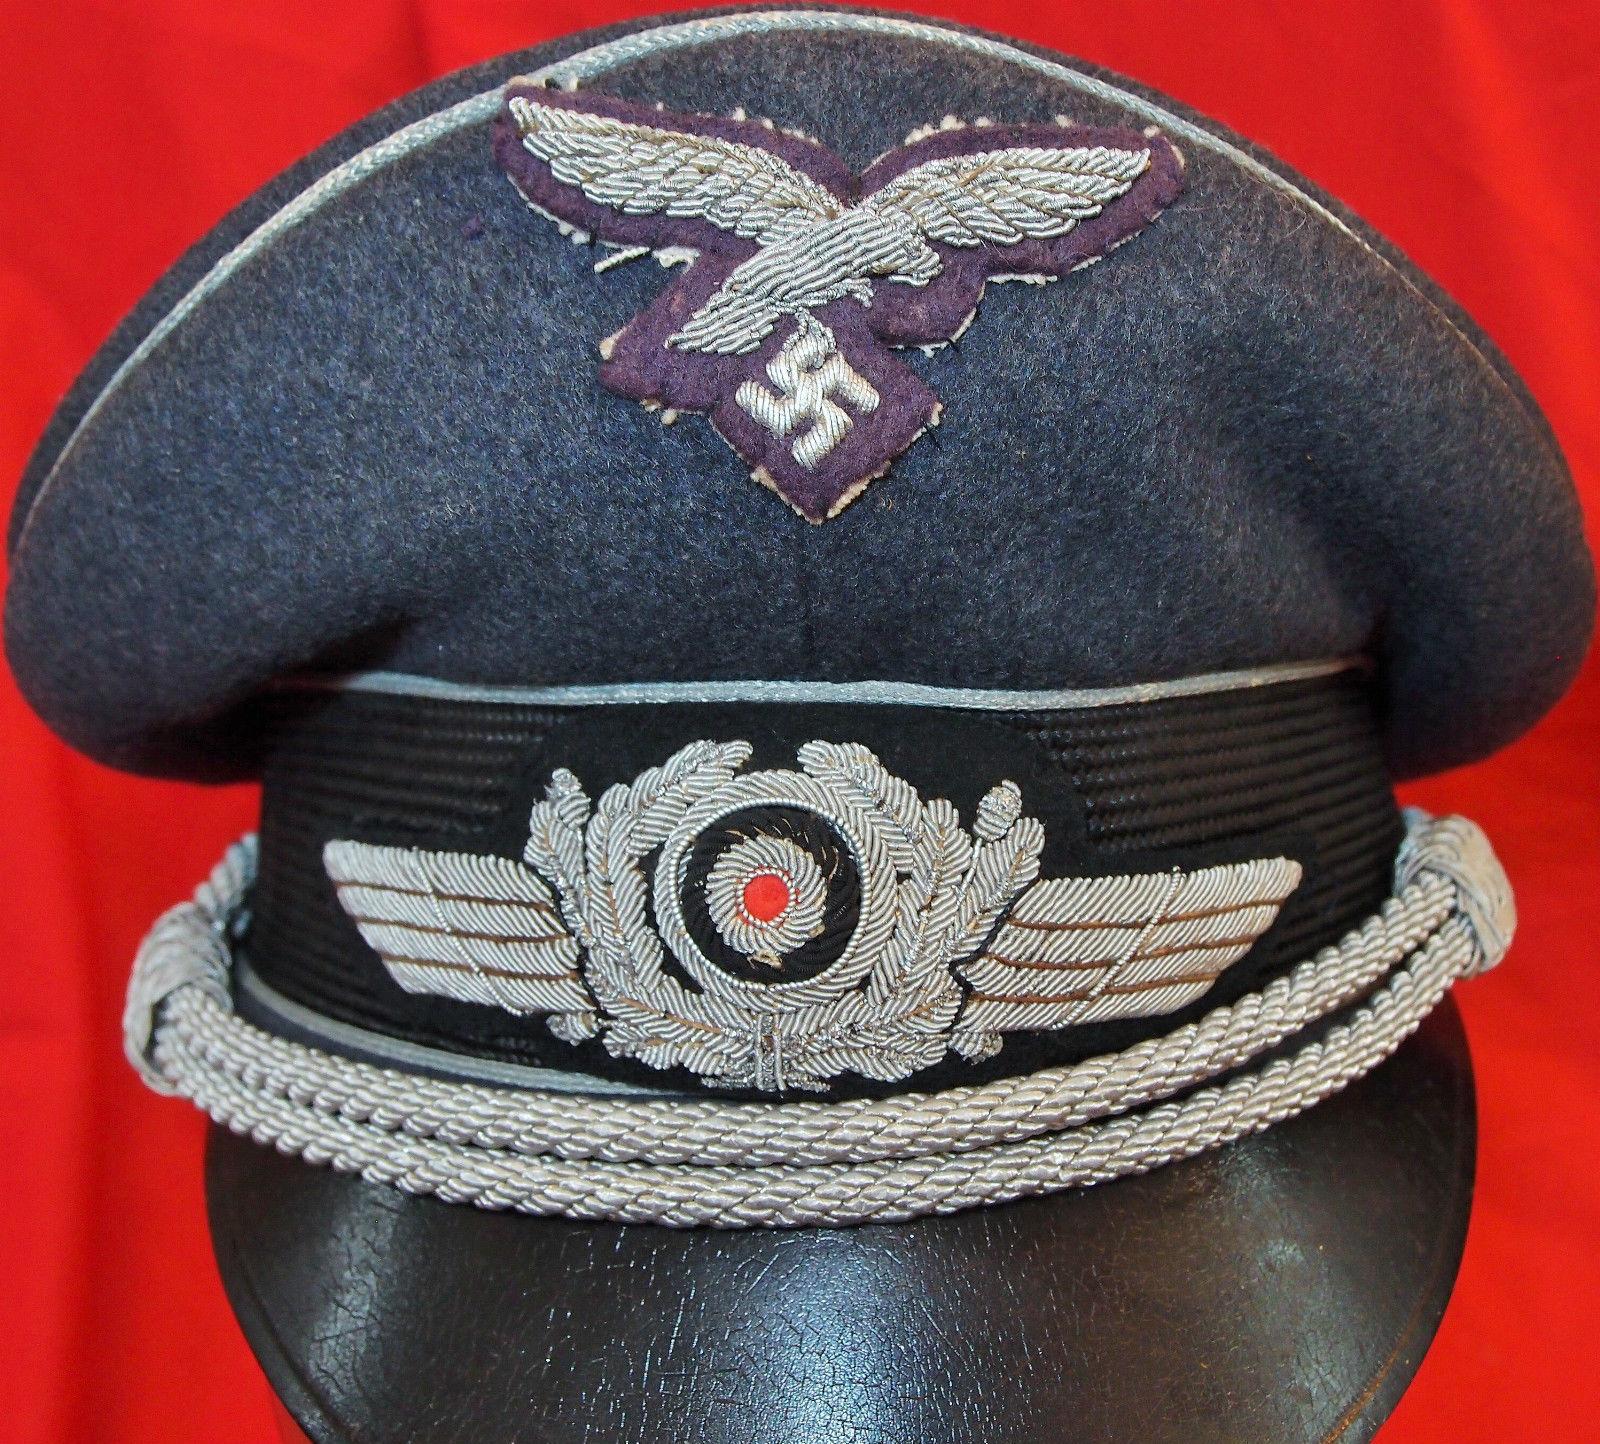 Ww2 German Air Force Officer S Luftwaffe Visor Cap By Erel